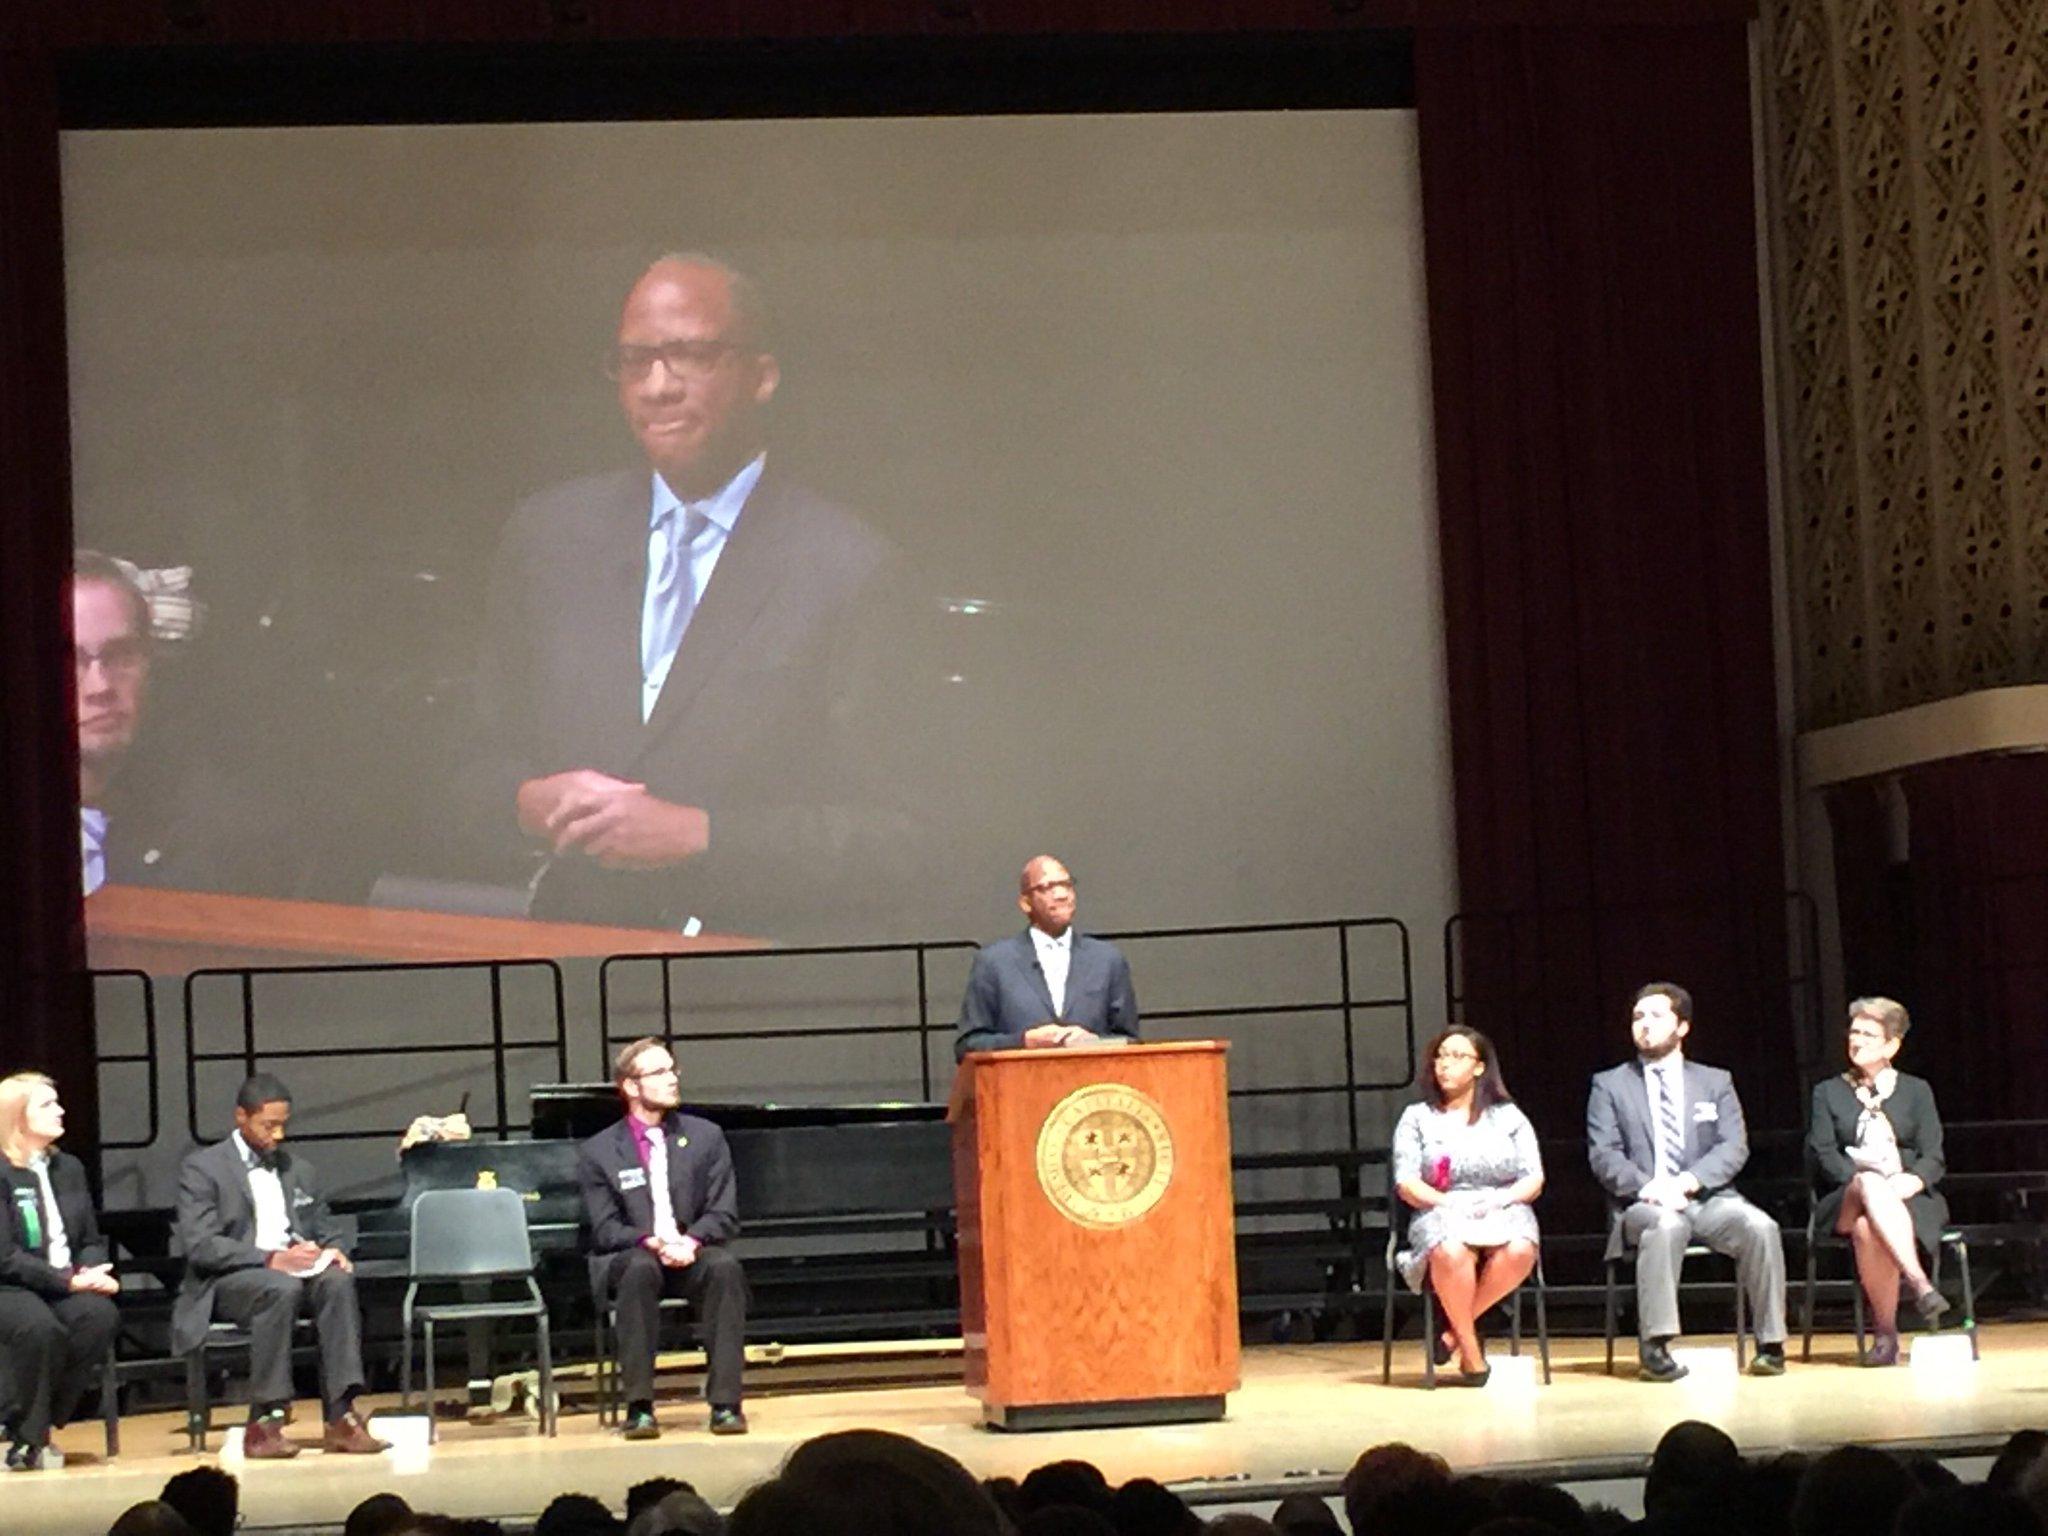 Wil Haygood offers the Gay S. Steele Keynote Address @Capital_U #MLKDayOfLearning. #Columbus #Ohio #LawSchool https://t.co/o4v4WTxezU